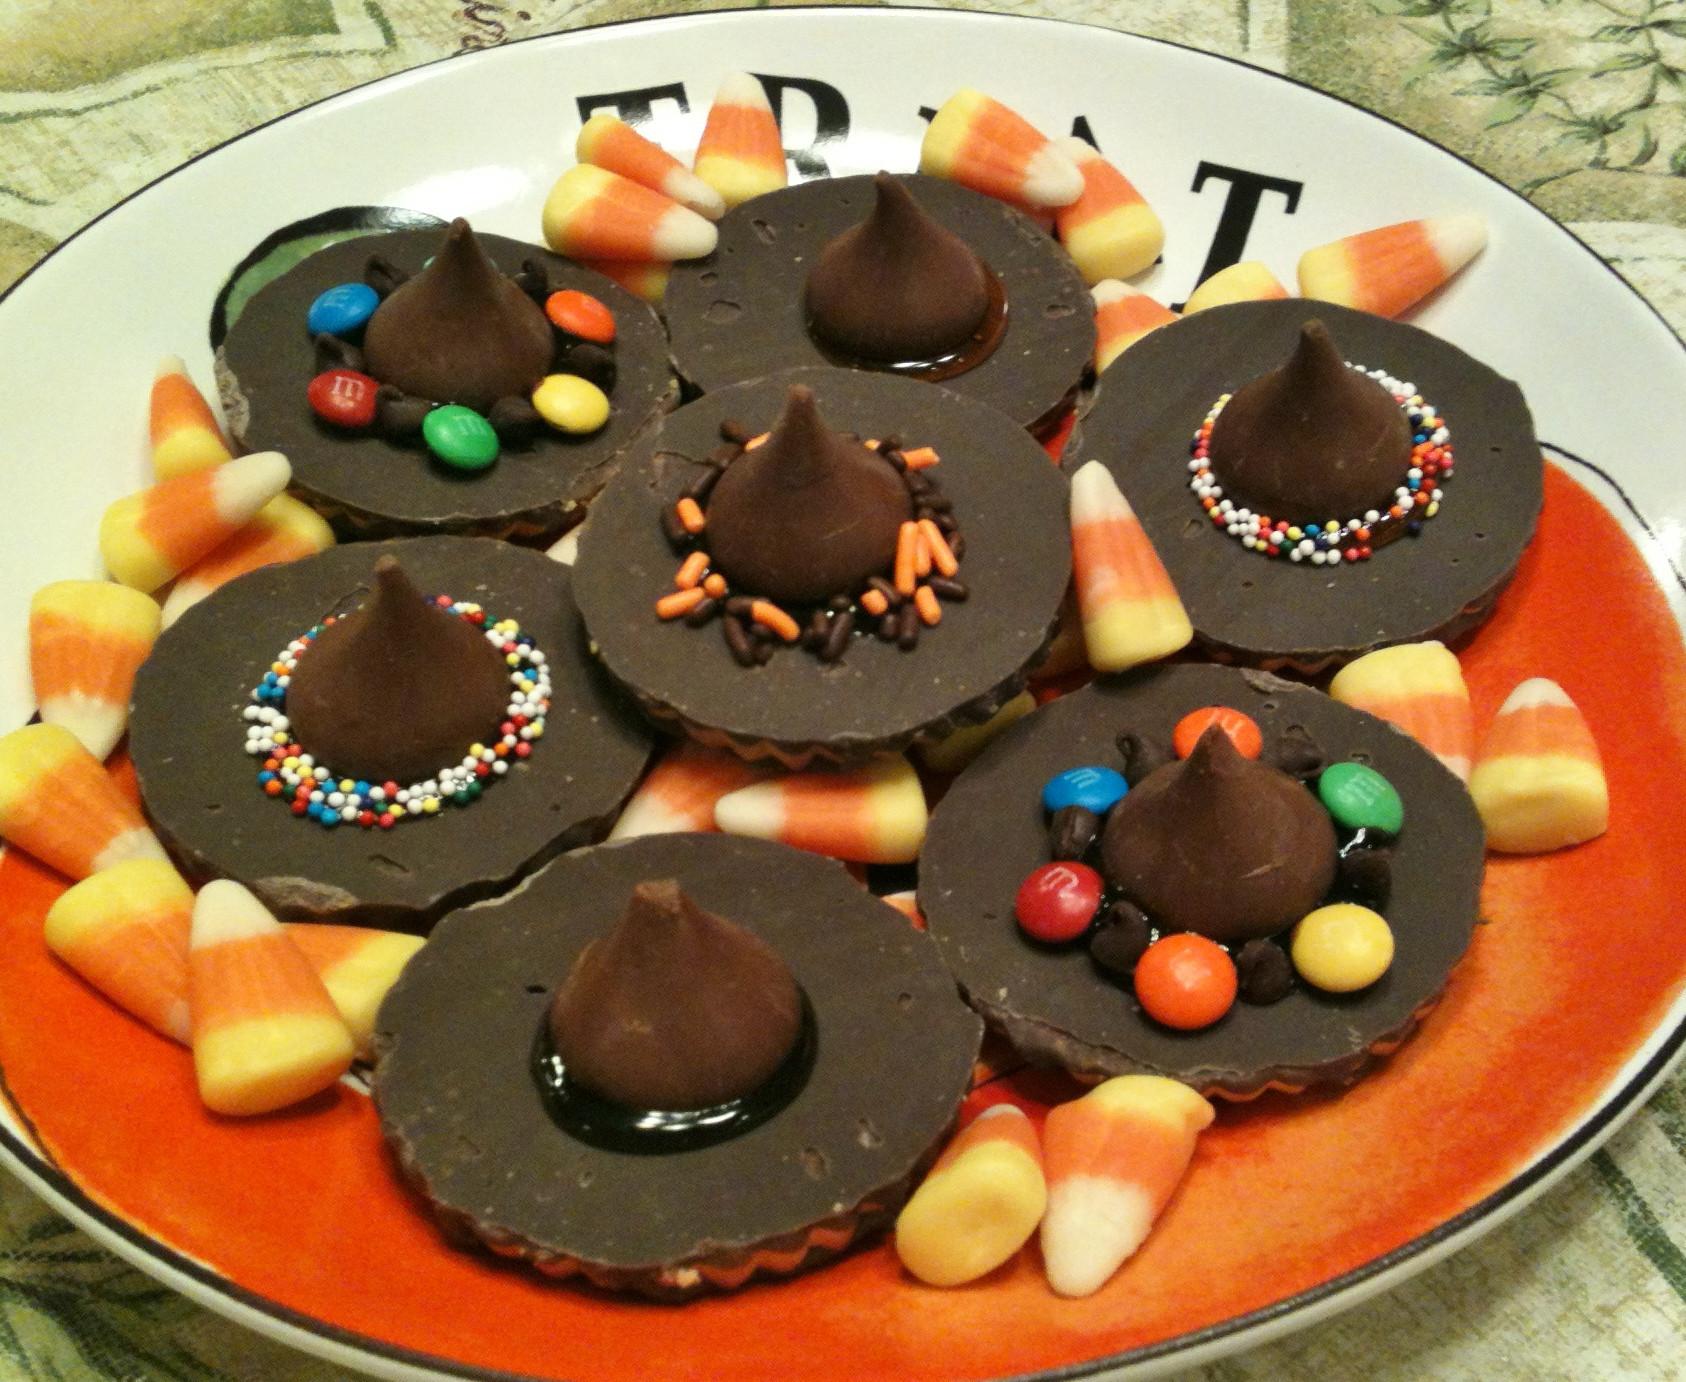 Halloween Desserts No Bake  Last Minute No Bake Halloween Treats Juggling with Julia